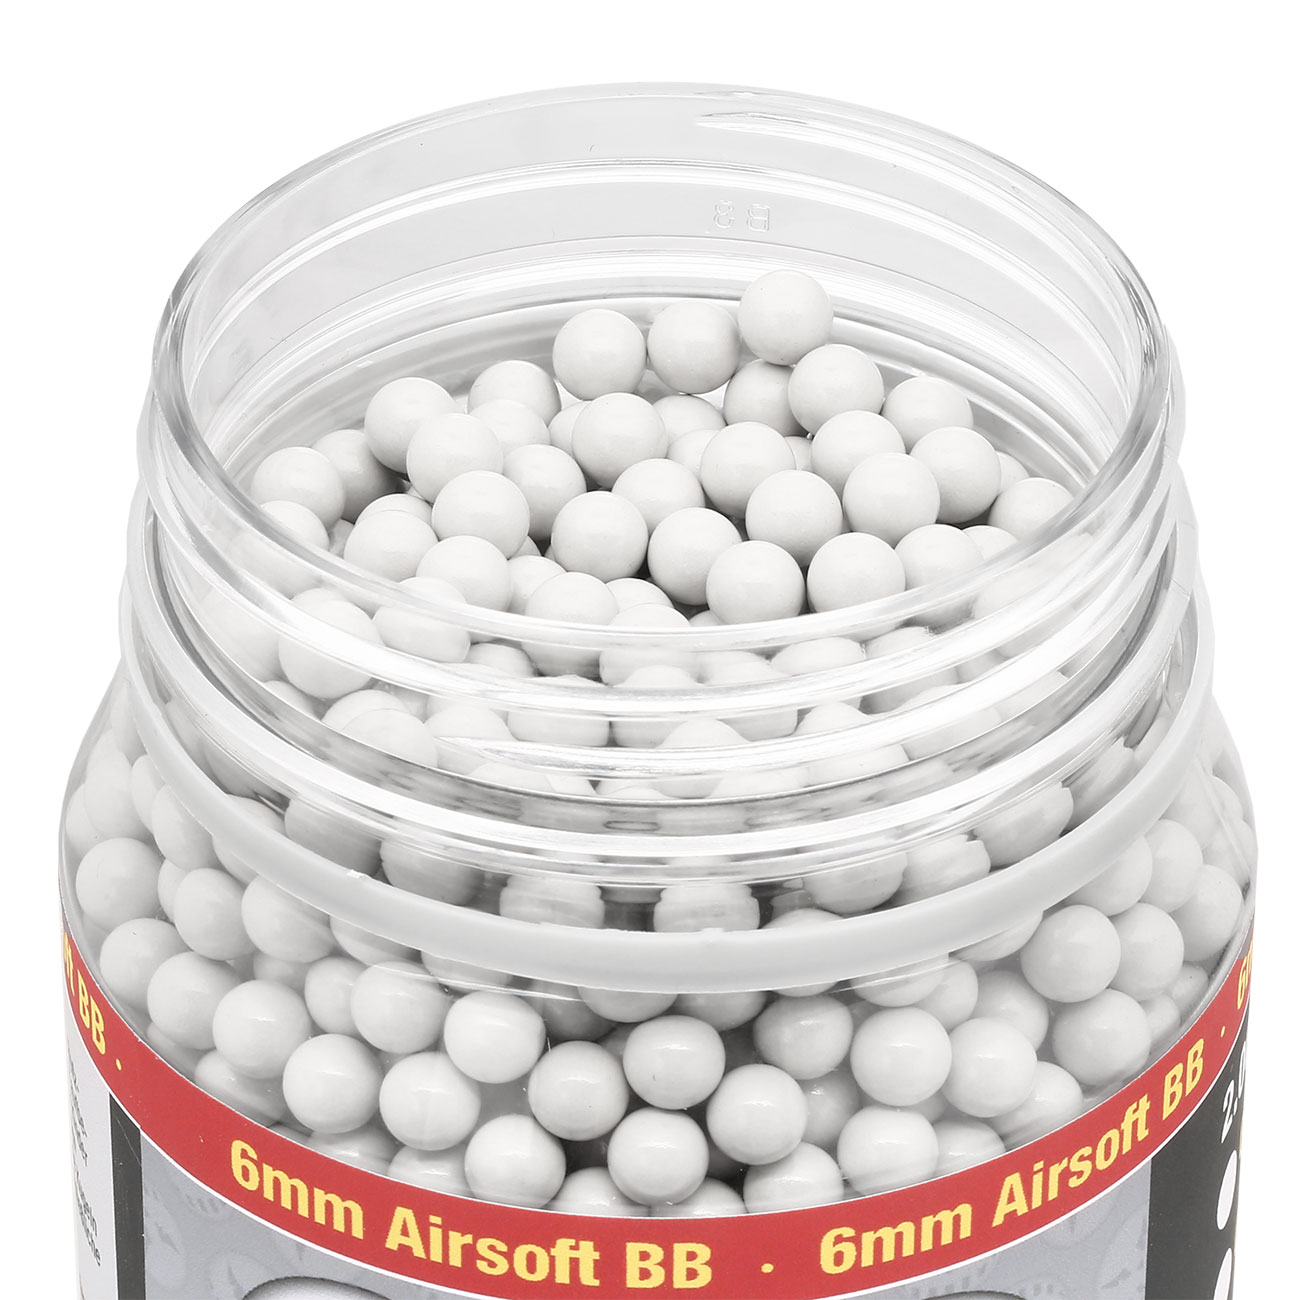 MadBull Heavy White Series BBs 0.45g 2.000er Container weiss Softair Munition